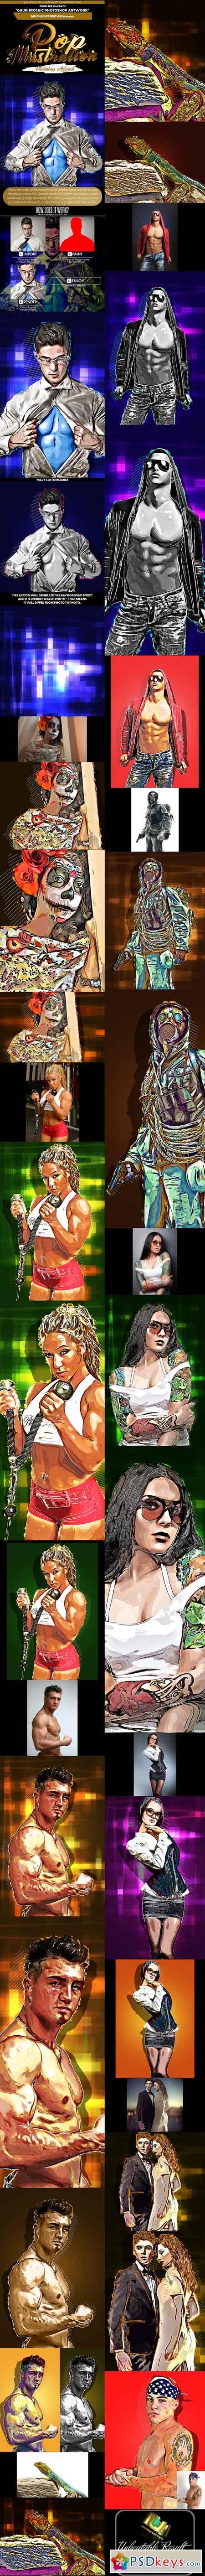 Pop Illustration Photoshop Artwork 21894738